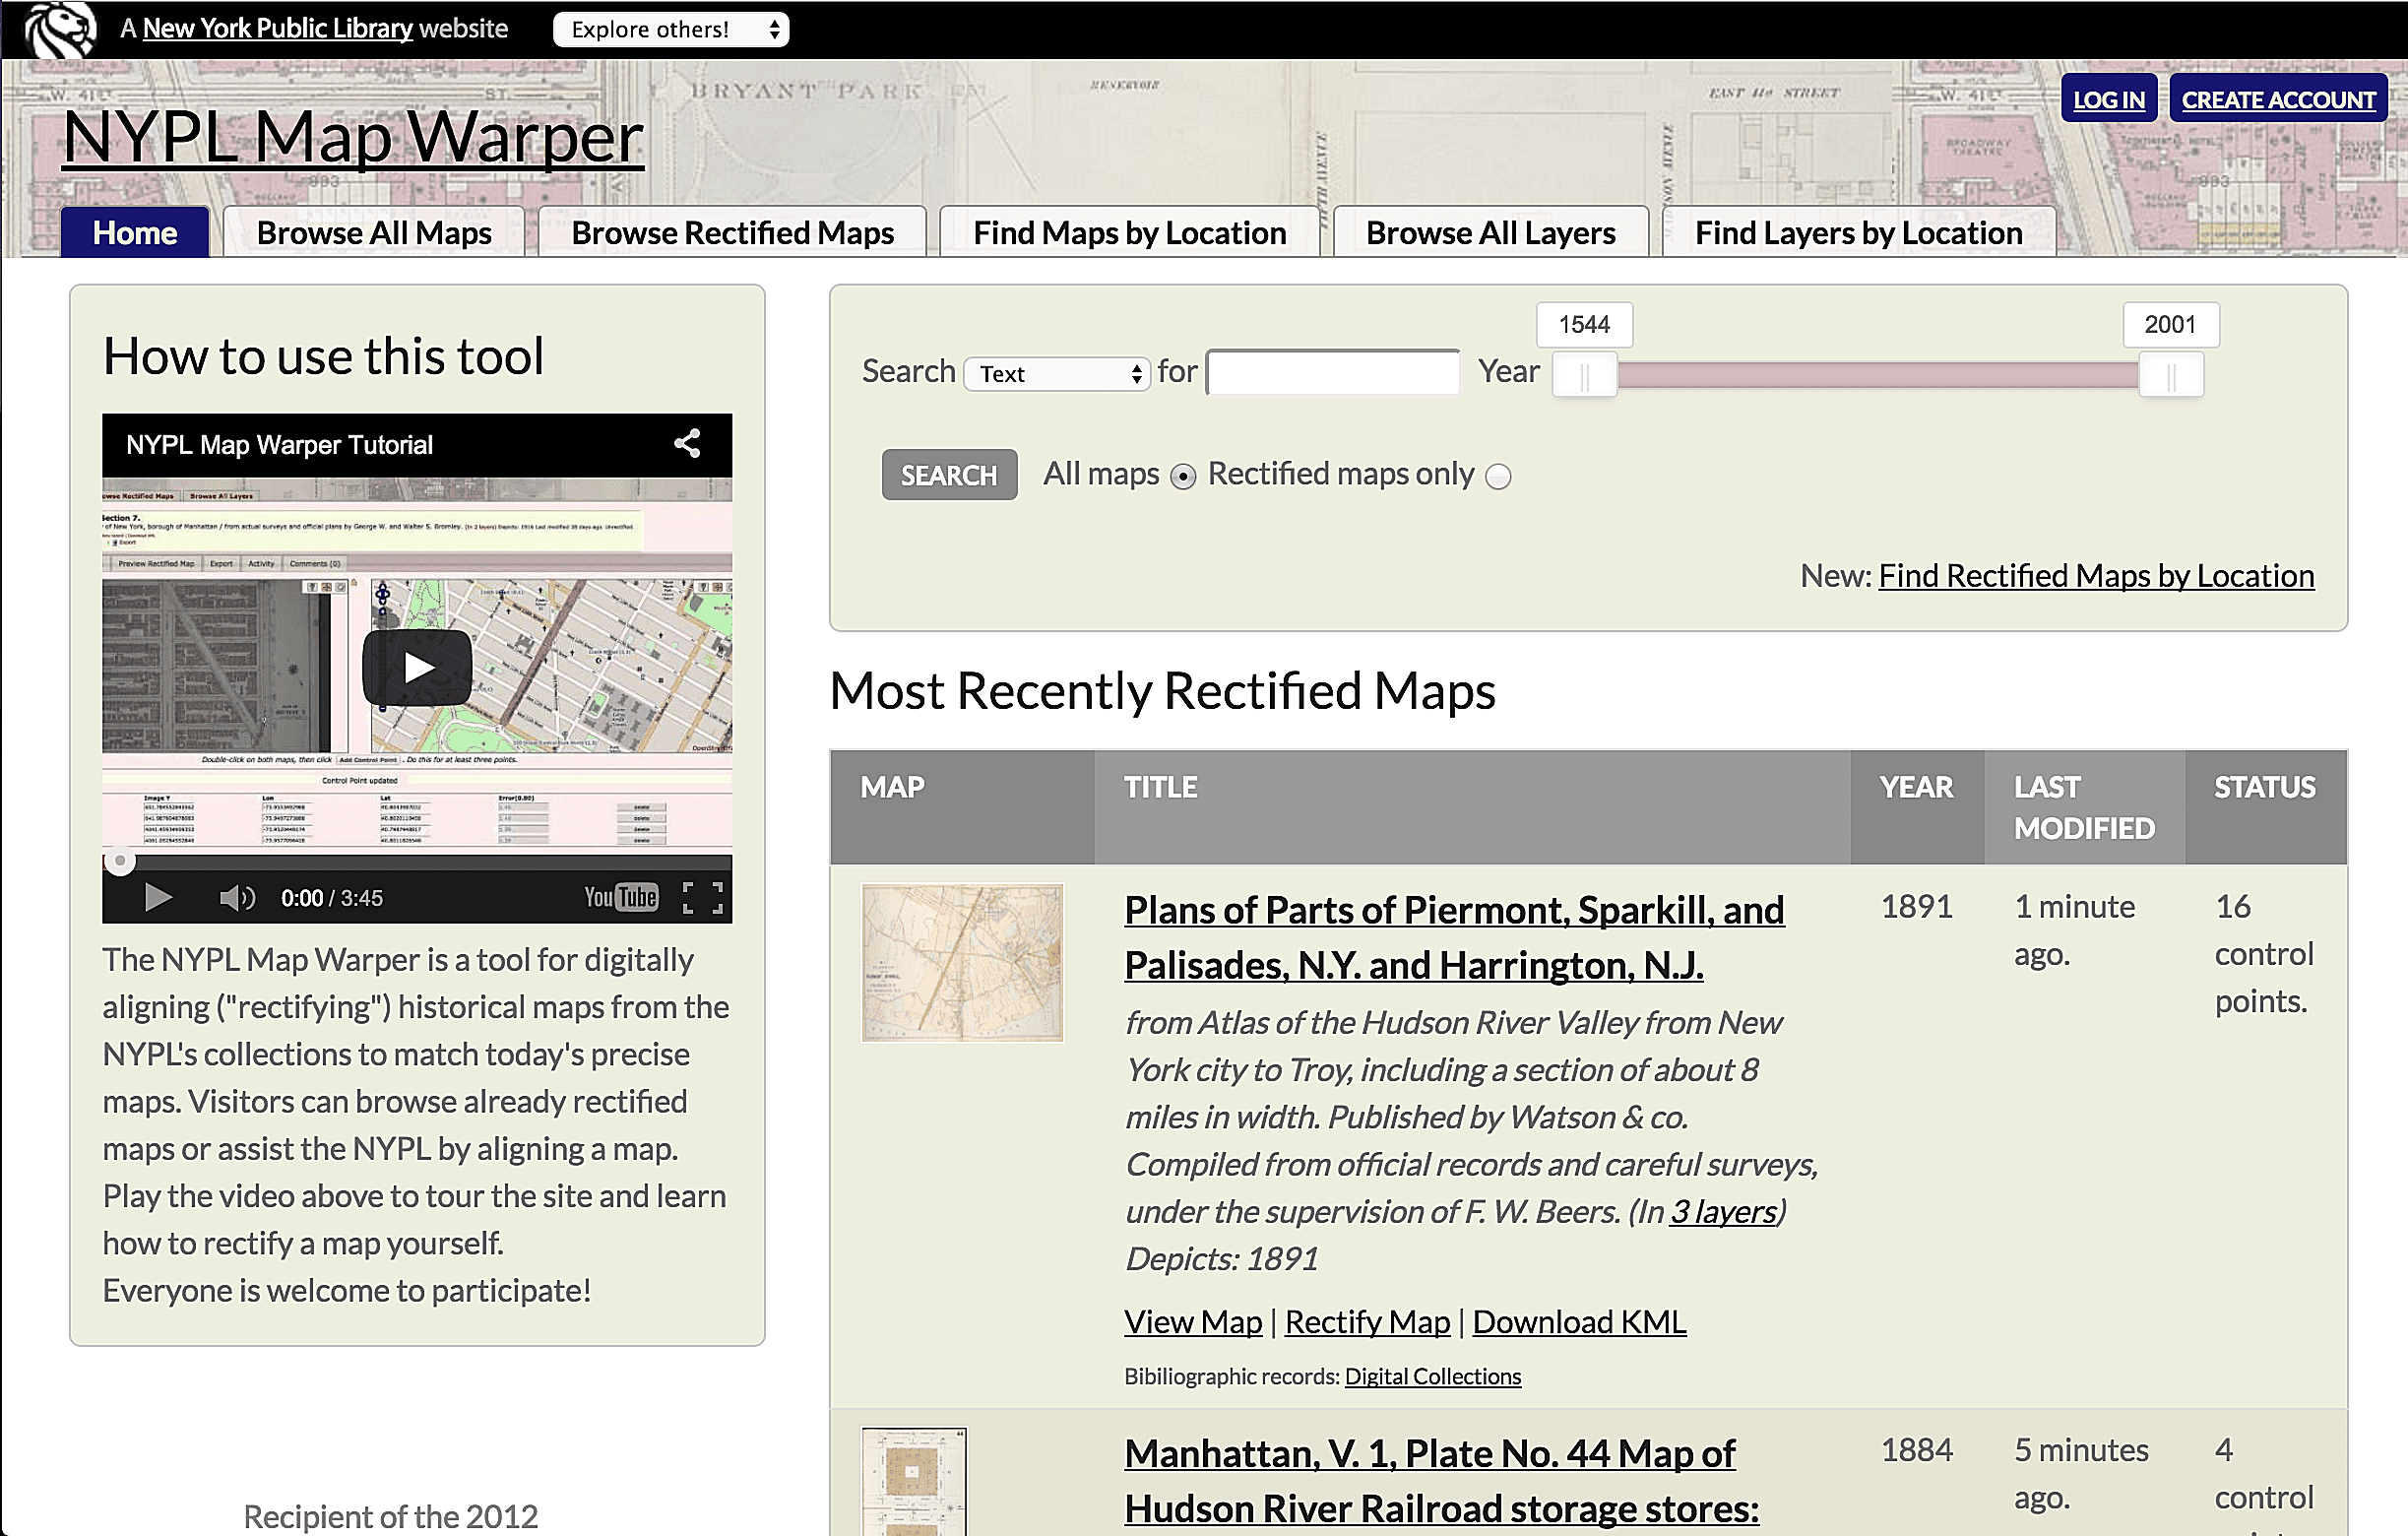 NYPL Map Warper